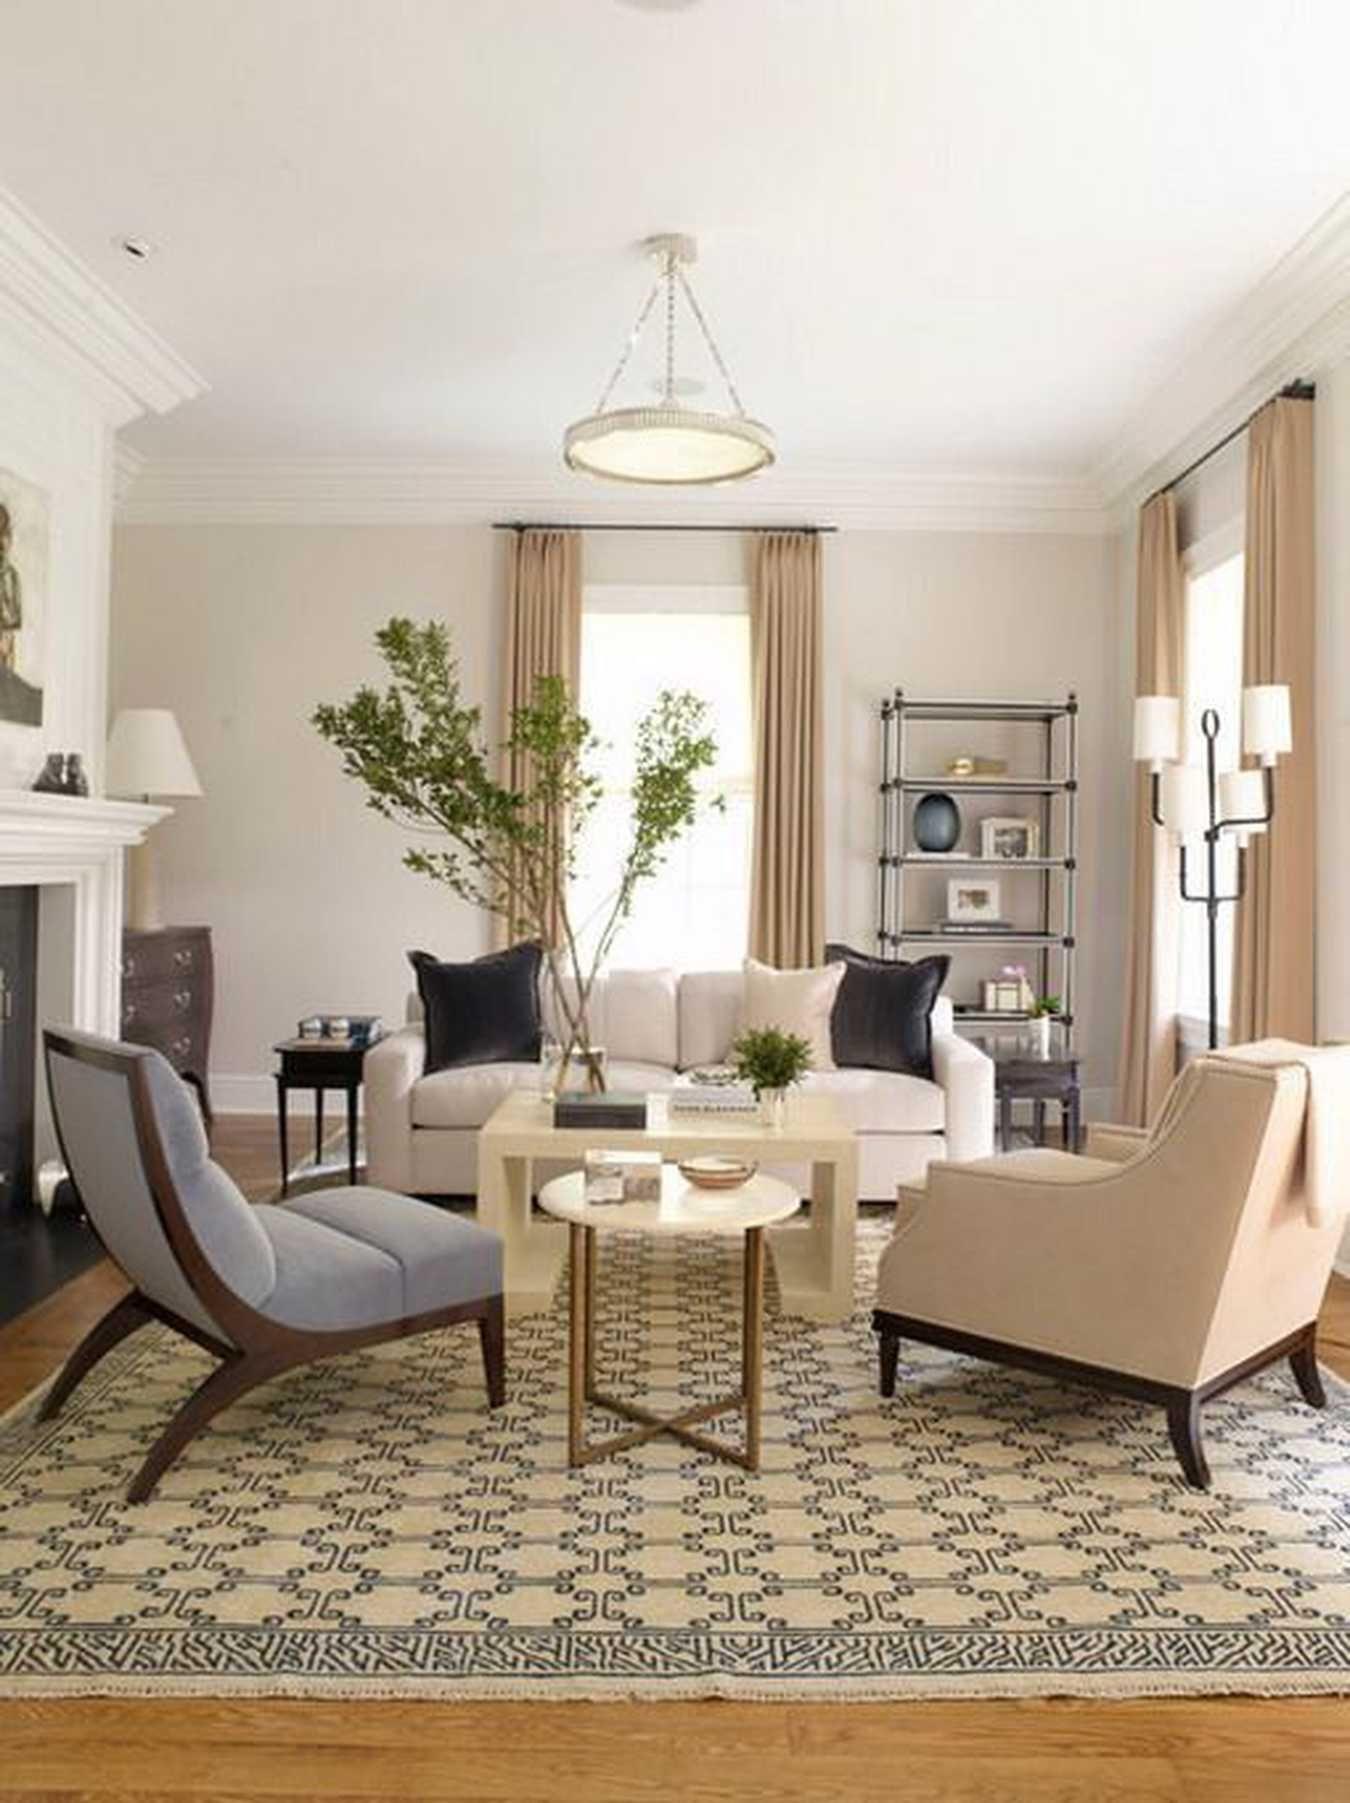 Transitional Decorating Style Photos.Interior Design Style Quiz In 2019 Interior Design Styles